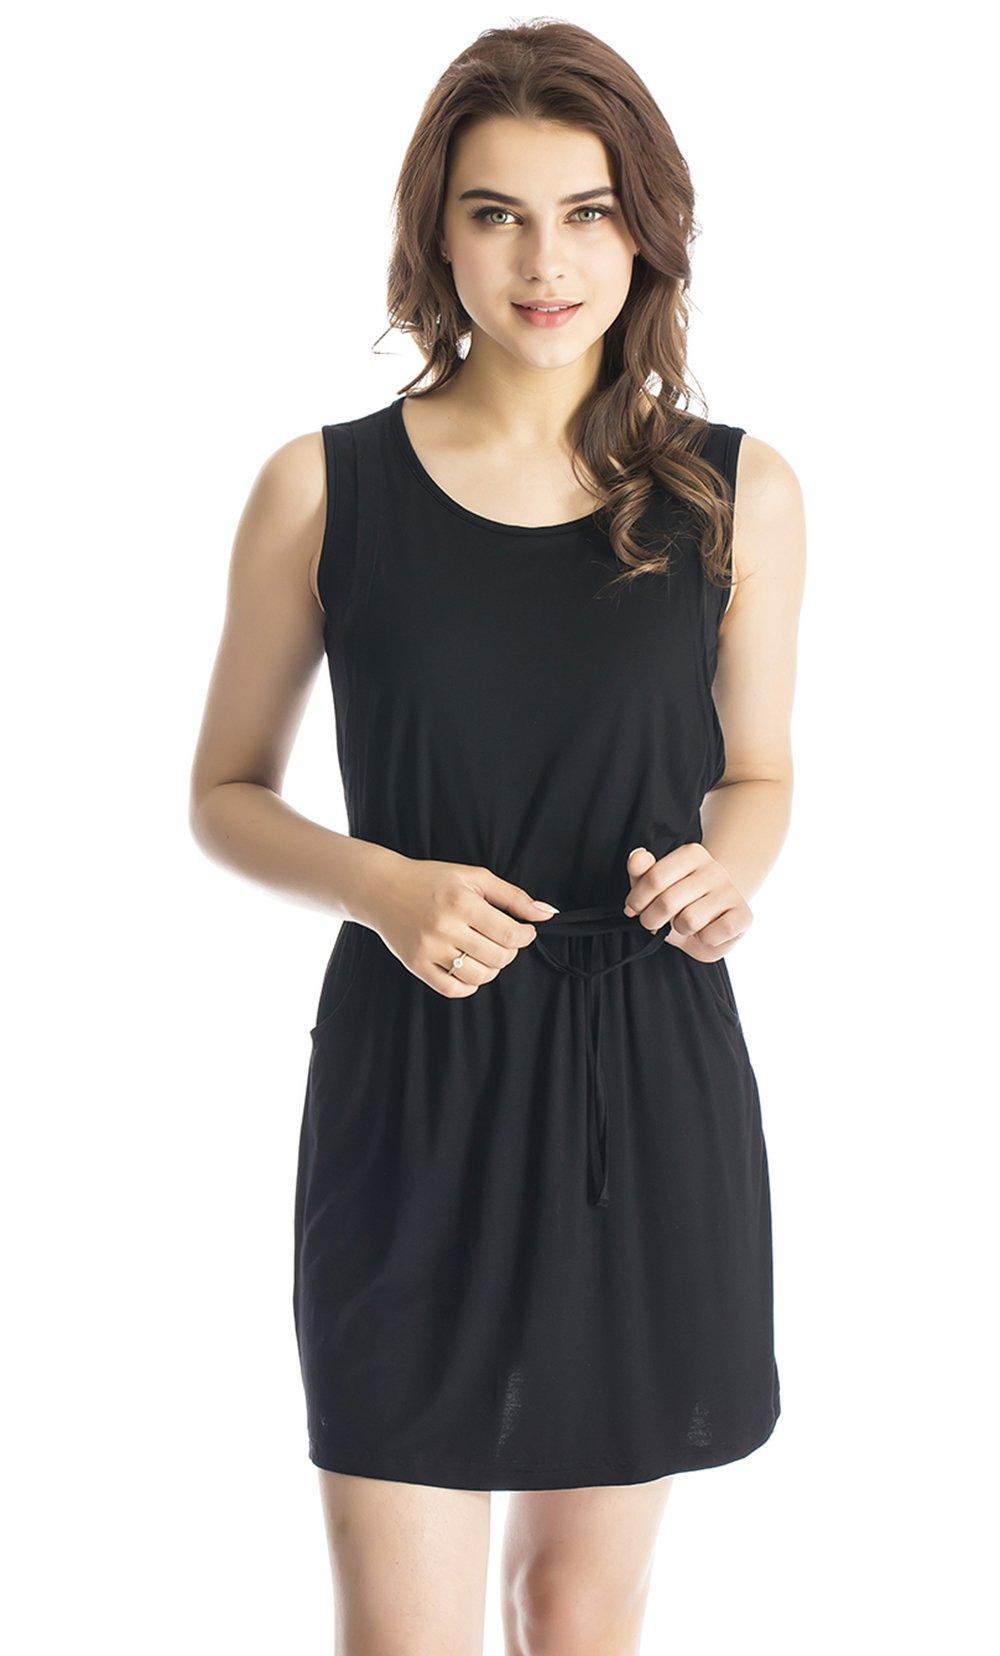 Modern Mummy Women's Pure Sleeveless Maternity Nursing Dress for Breastfeeding Black Small